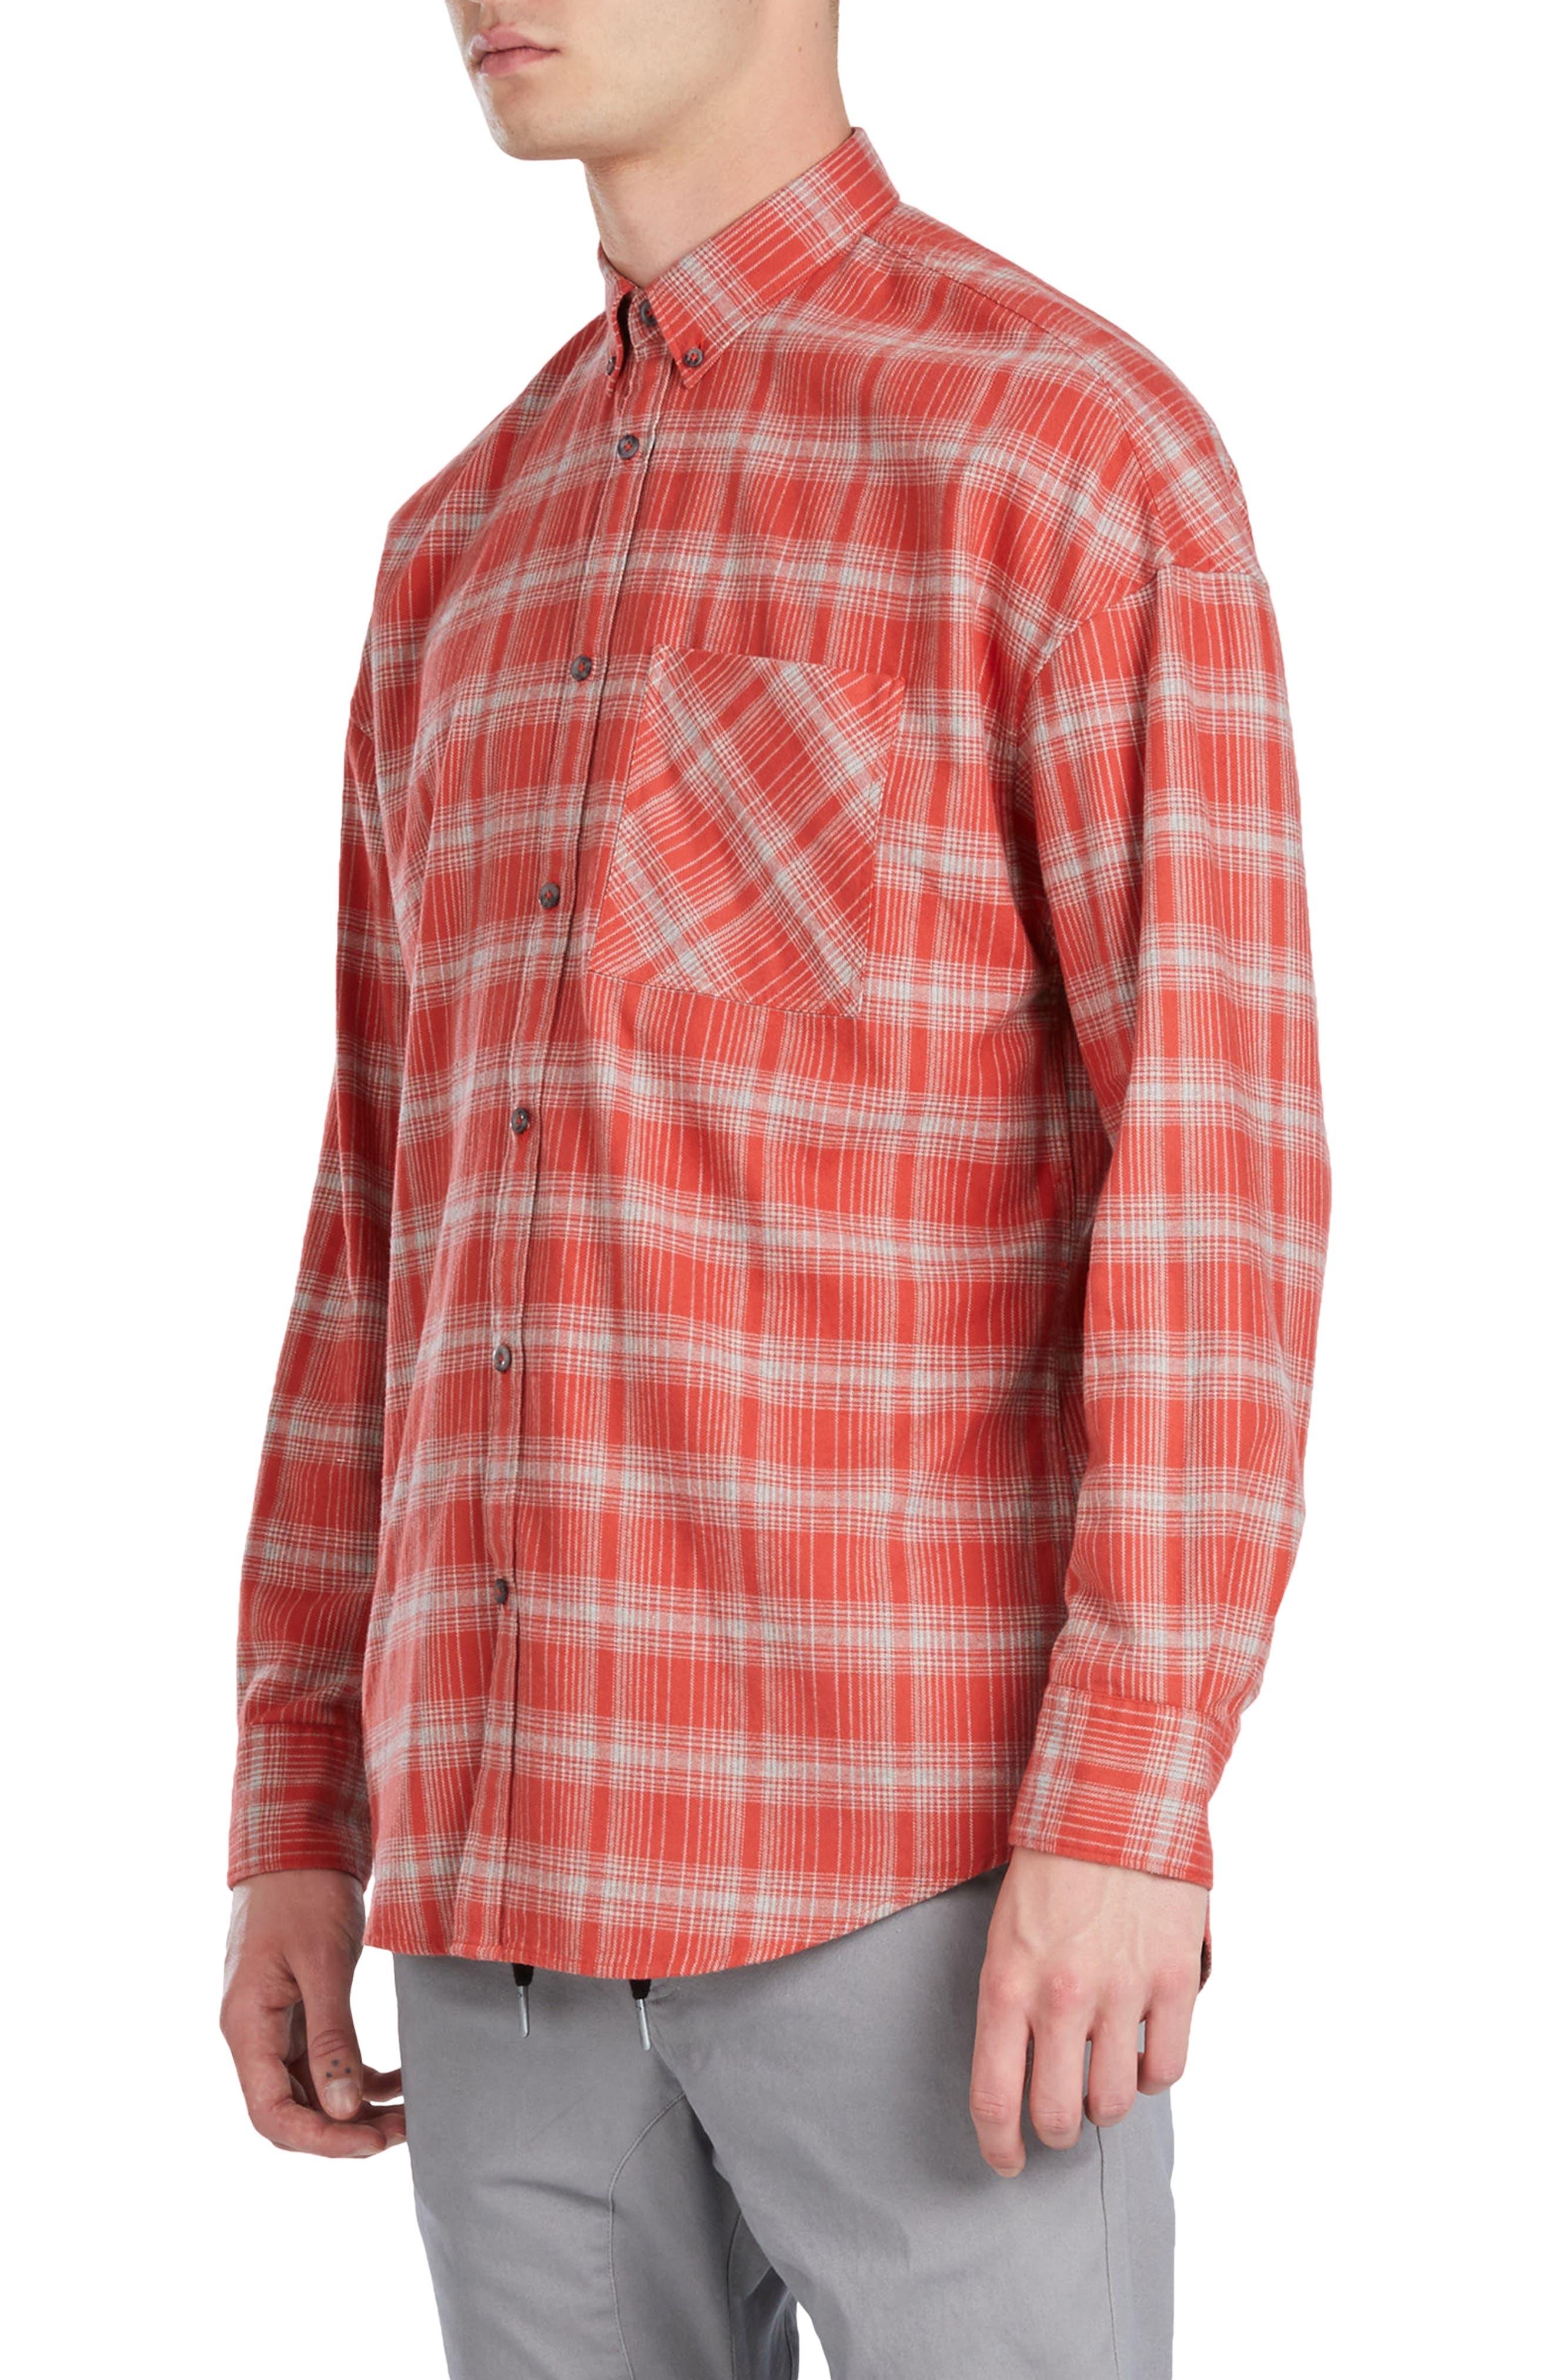 Rugger Plaid Sport Shirt,                             Alternate thumbnail 3, color,                             641